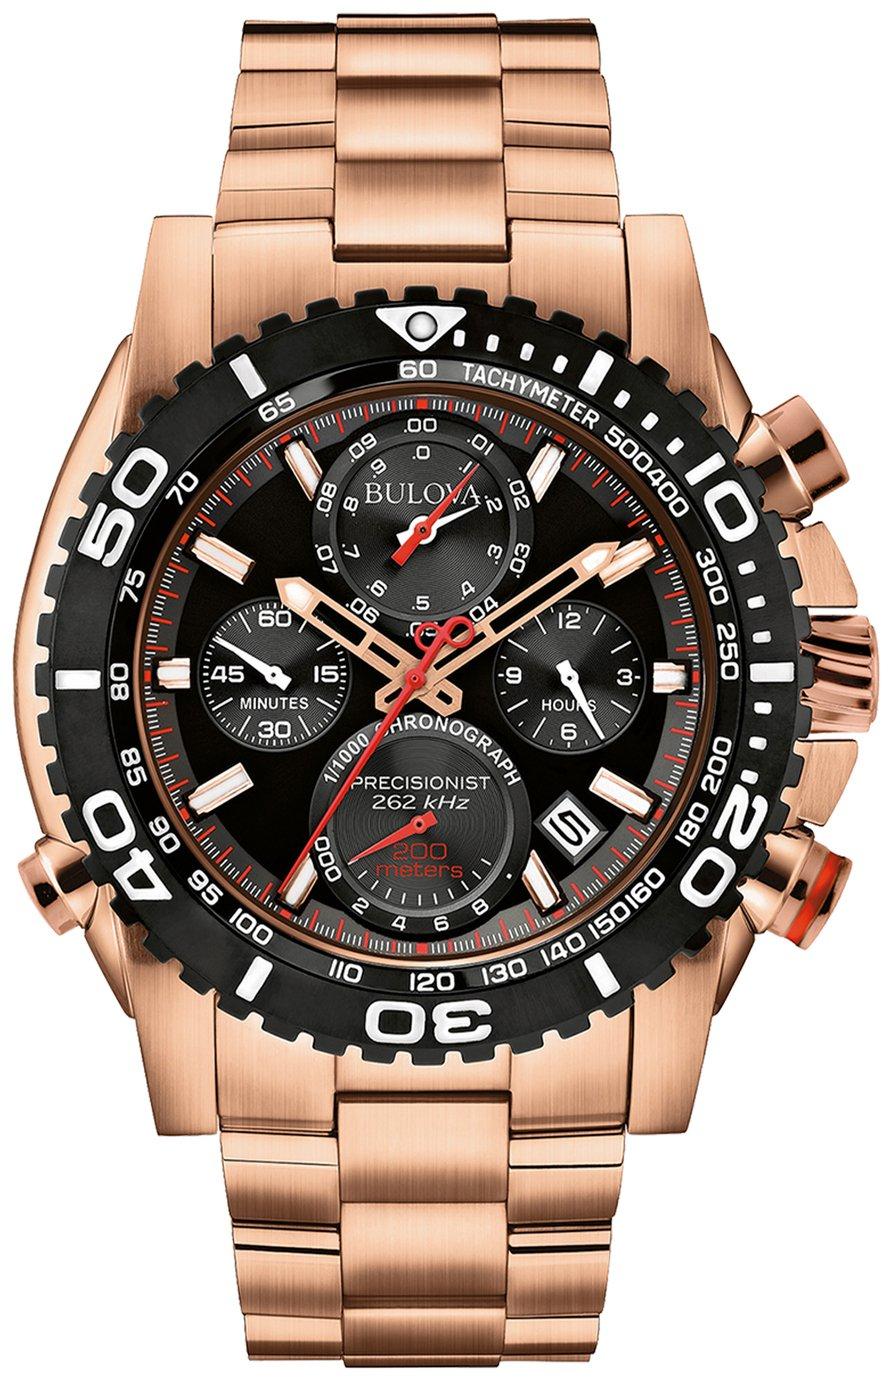 Bulova Men's Rose Gold Stainless Steel Chronograph Watch